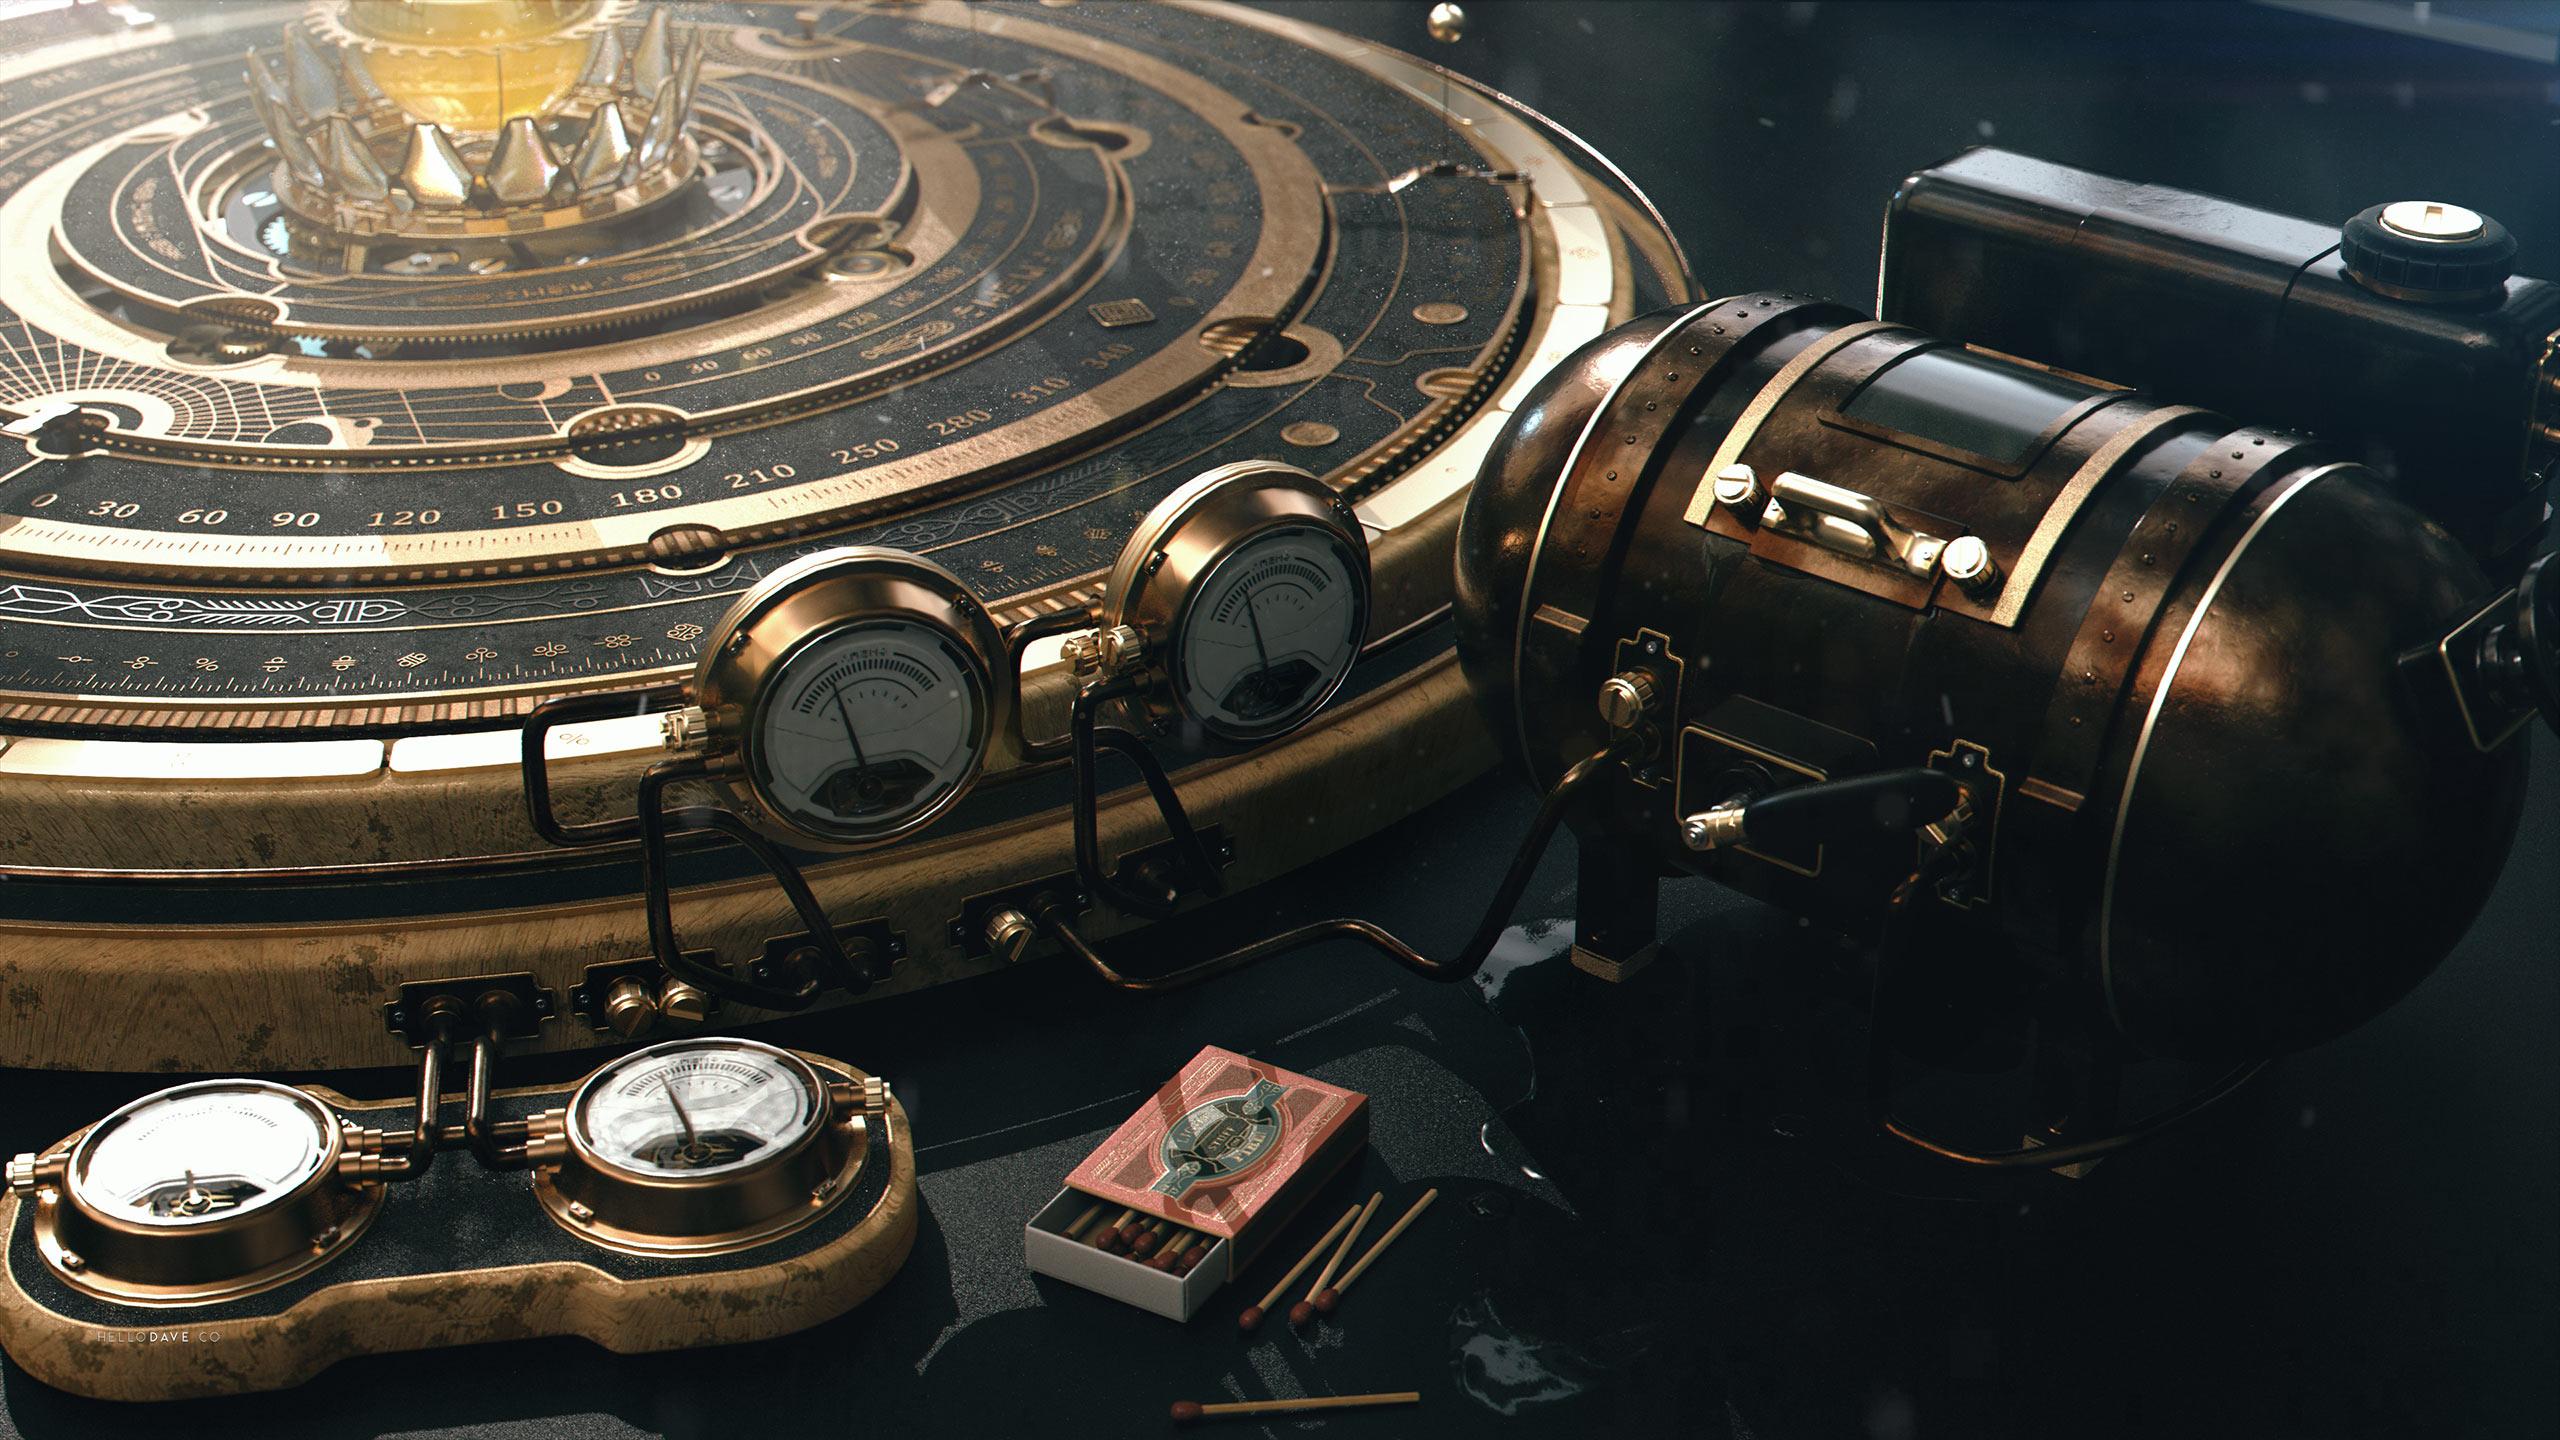 Steampunk_table_astrolabe_04_2K